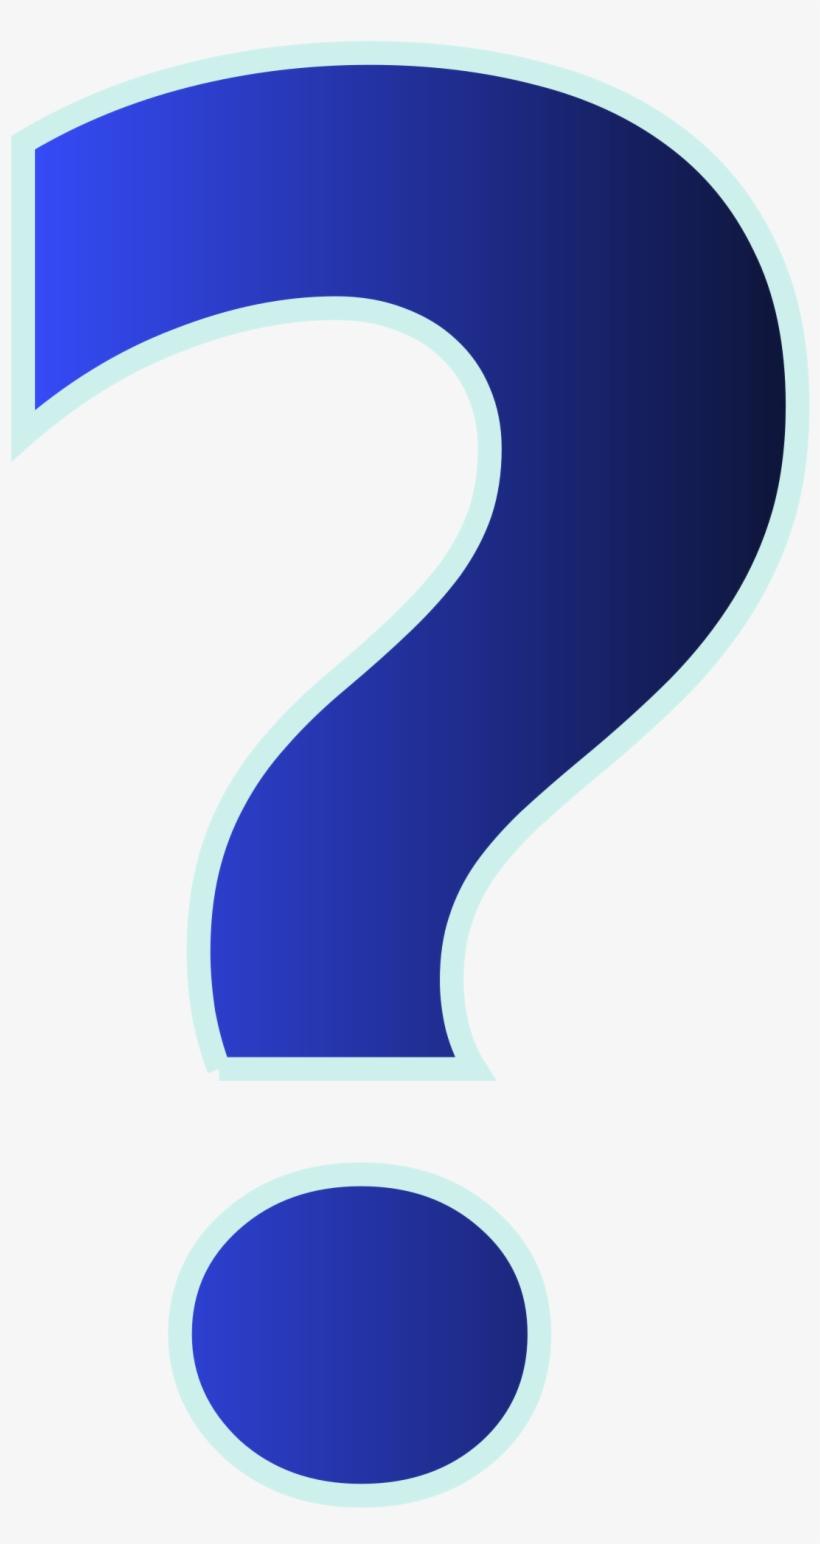 Clipart Question Mark - Question Mark, transparent png #212365